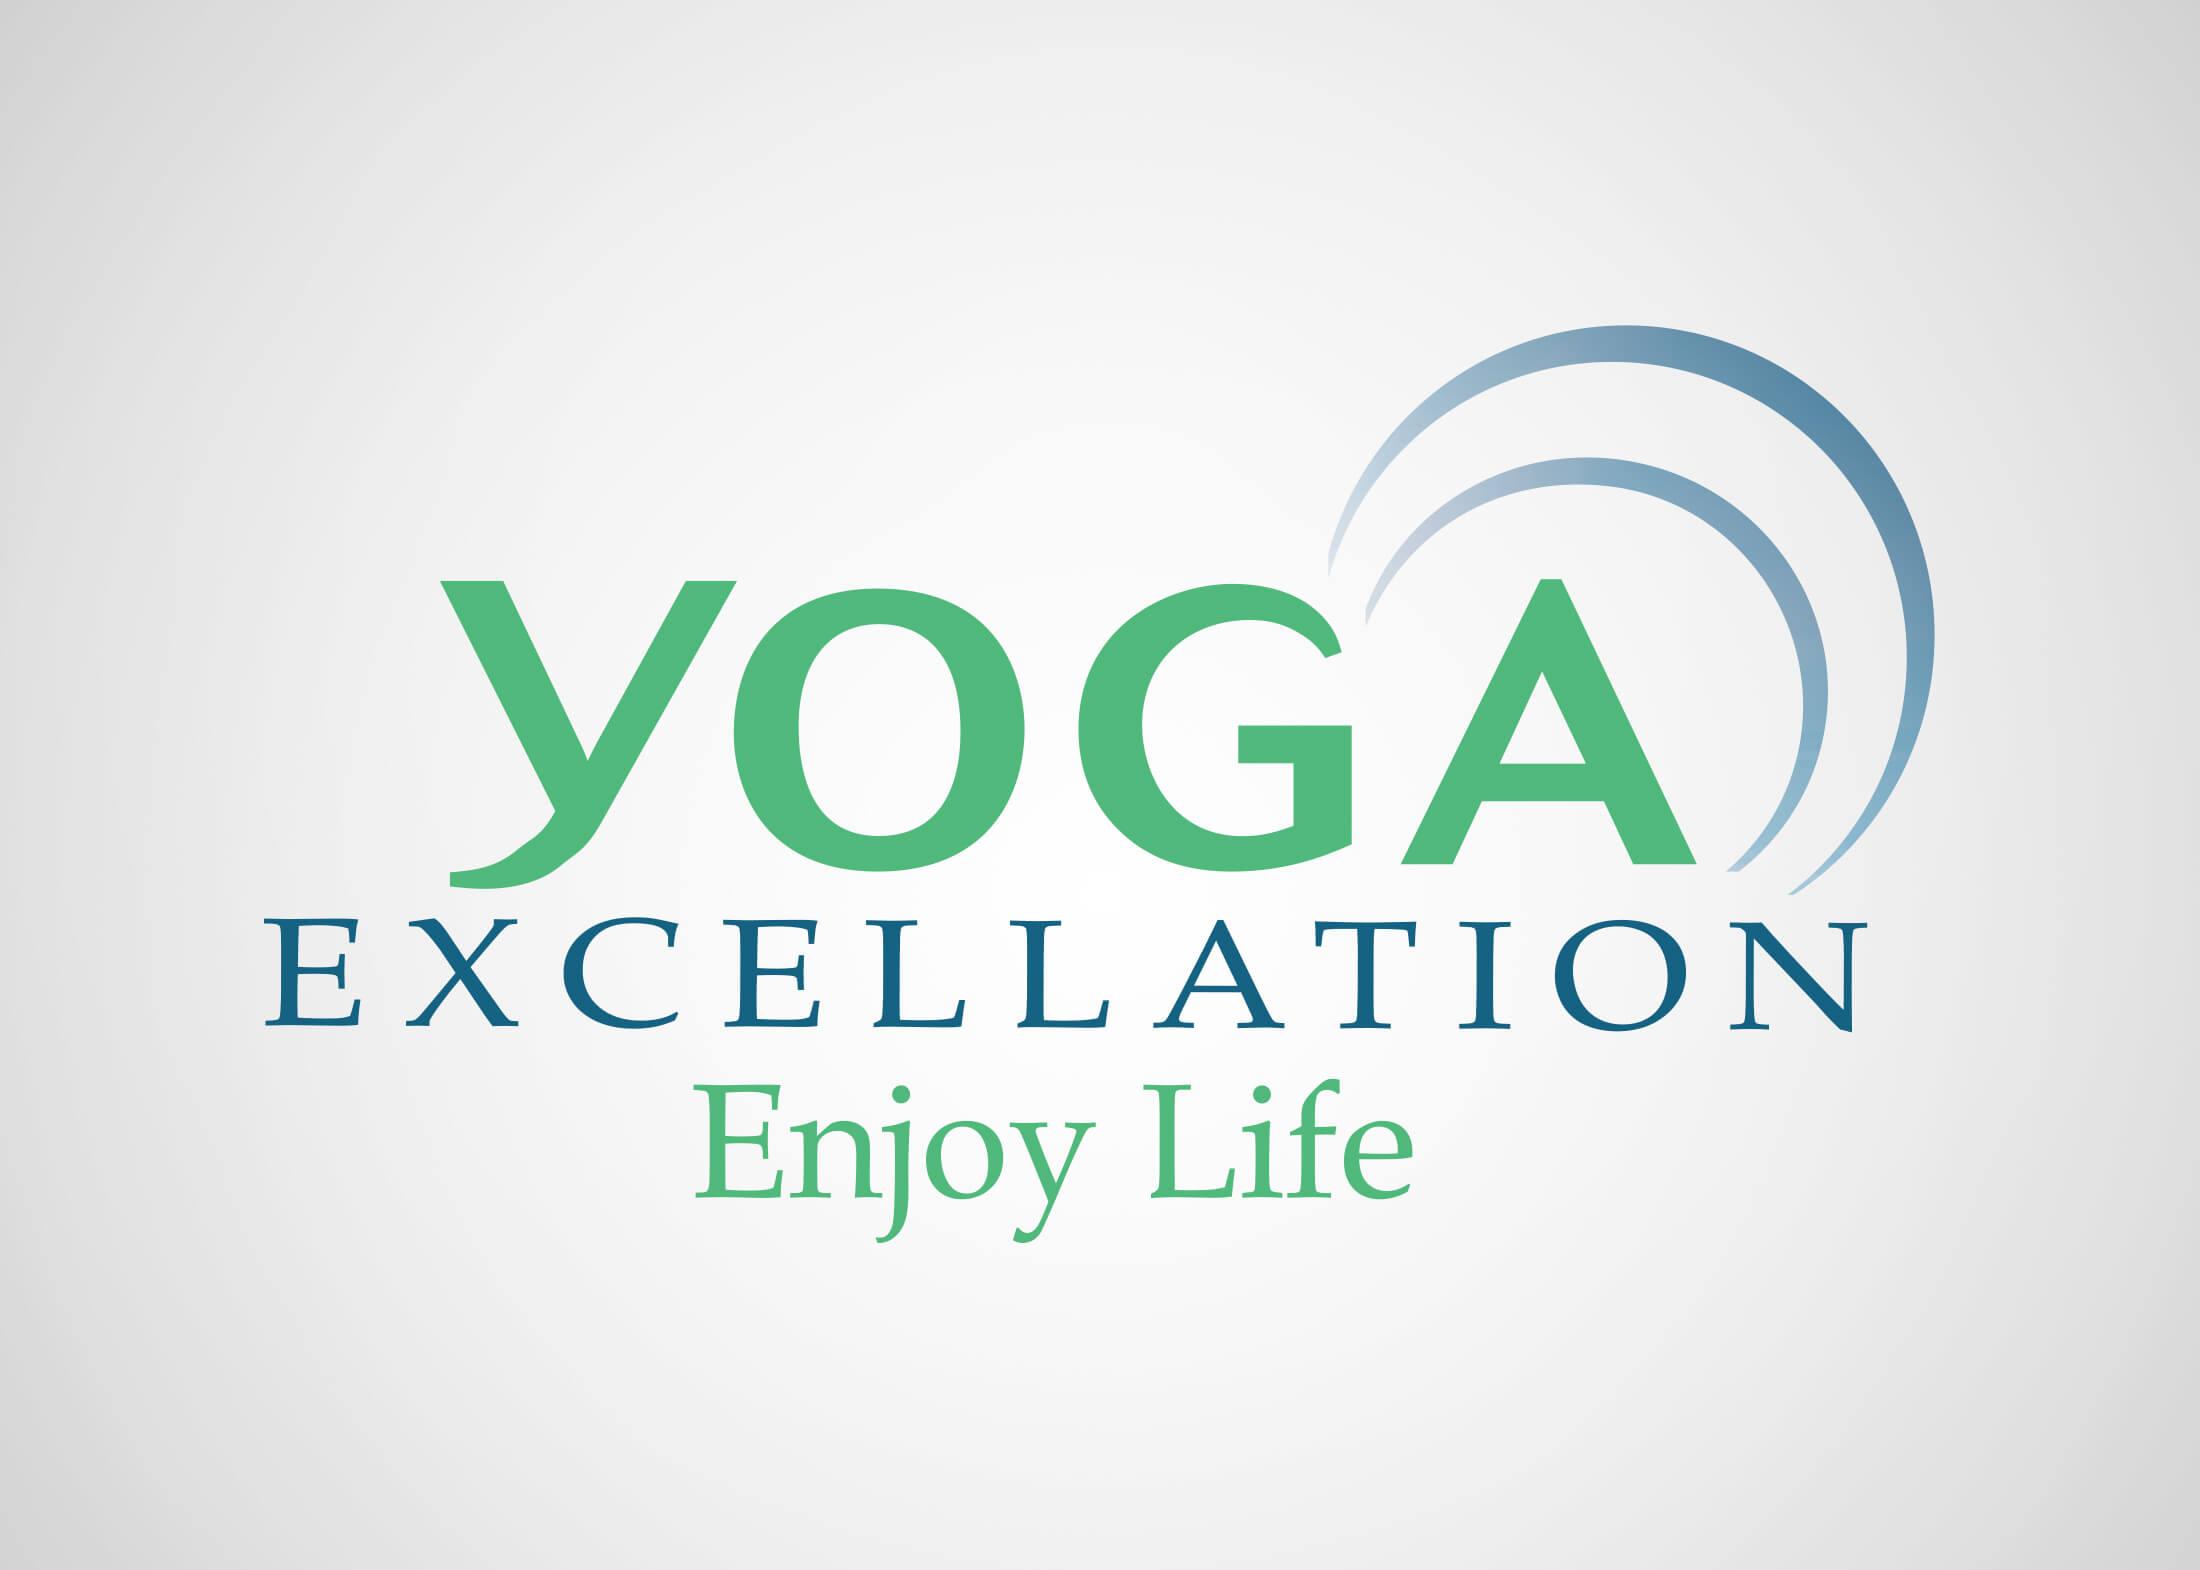 yoga-excellation-logo